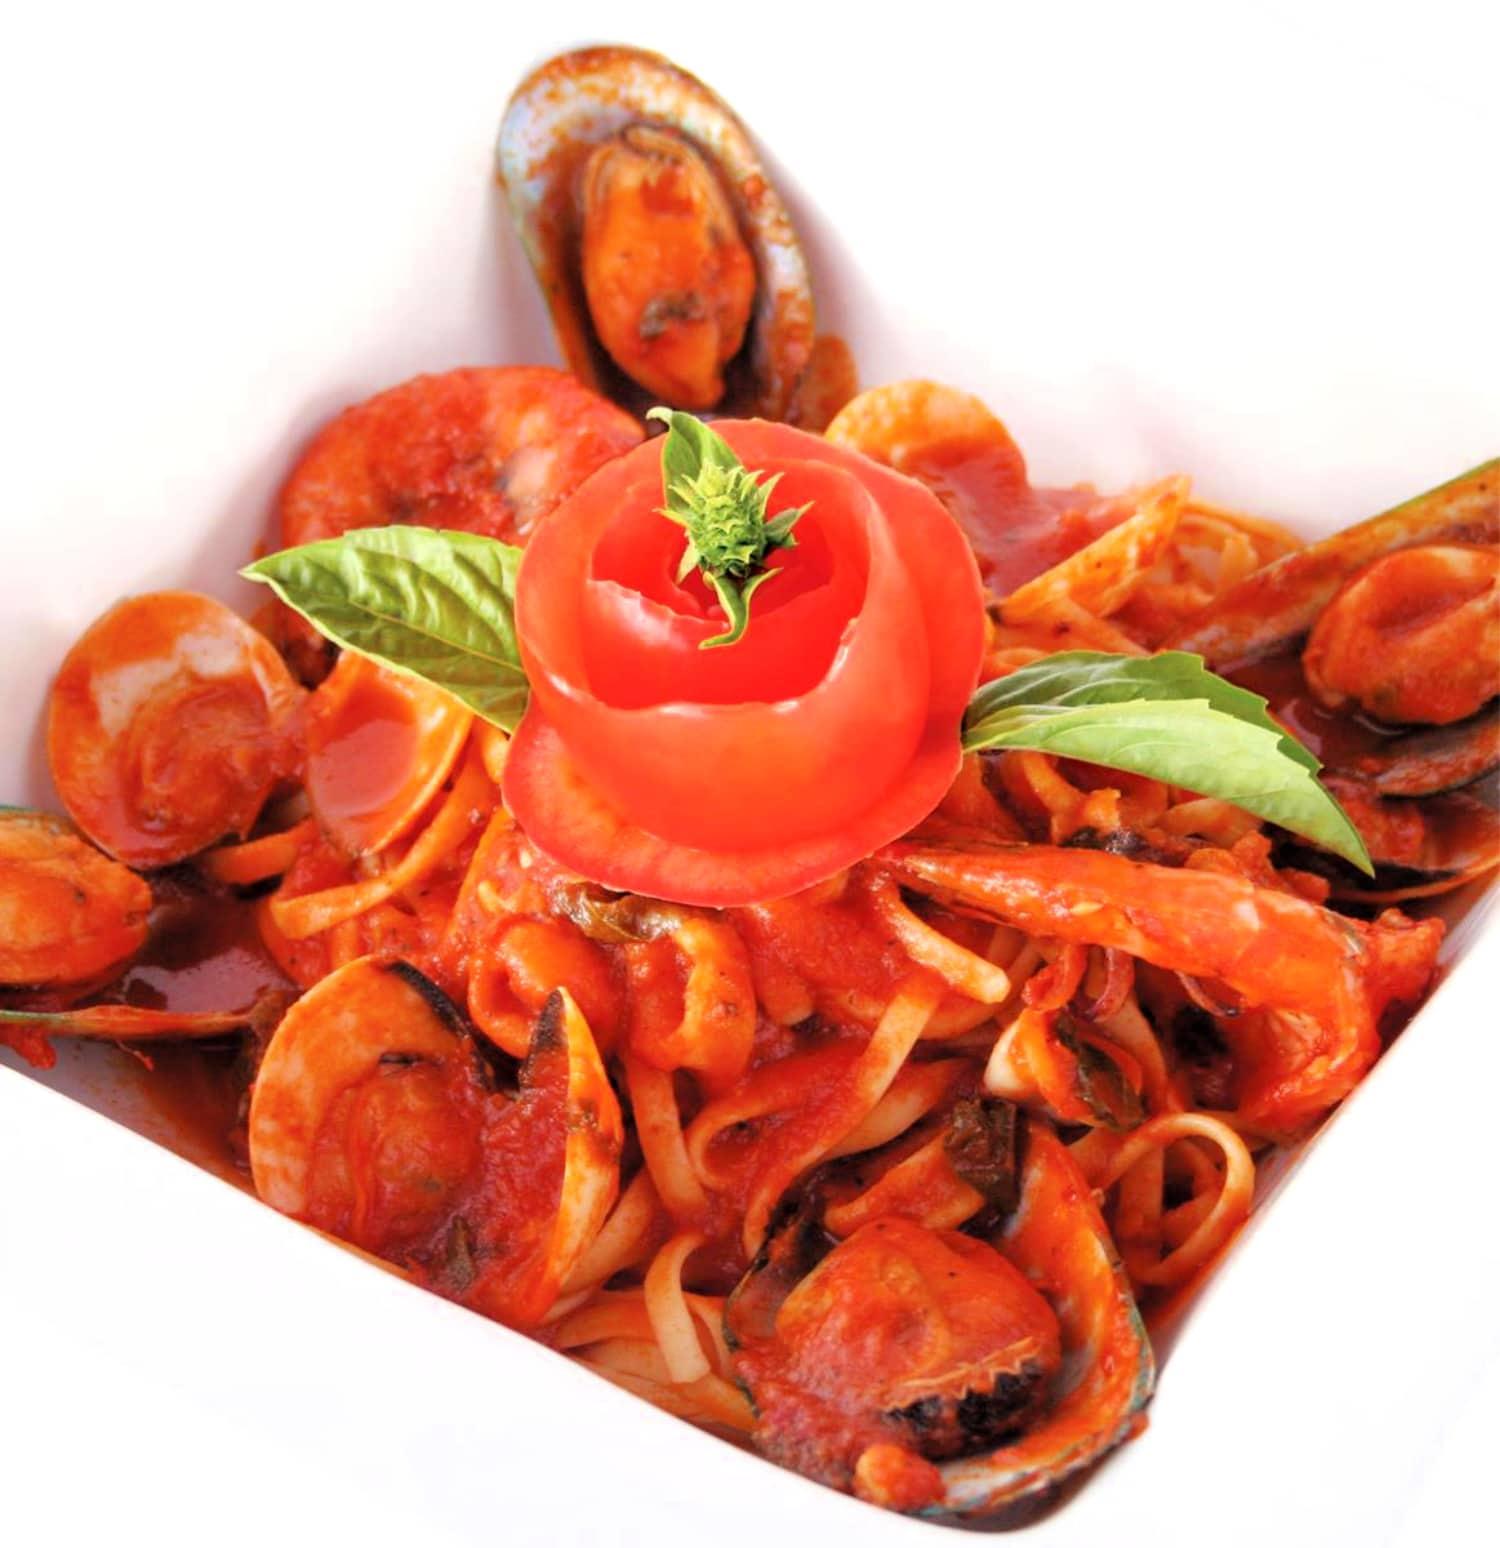 Best restaurants Carlsbad: Cicciotti's Trattoria & Seafood